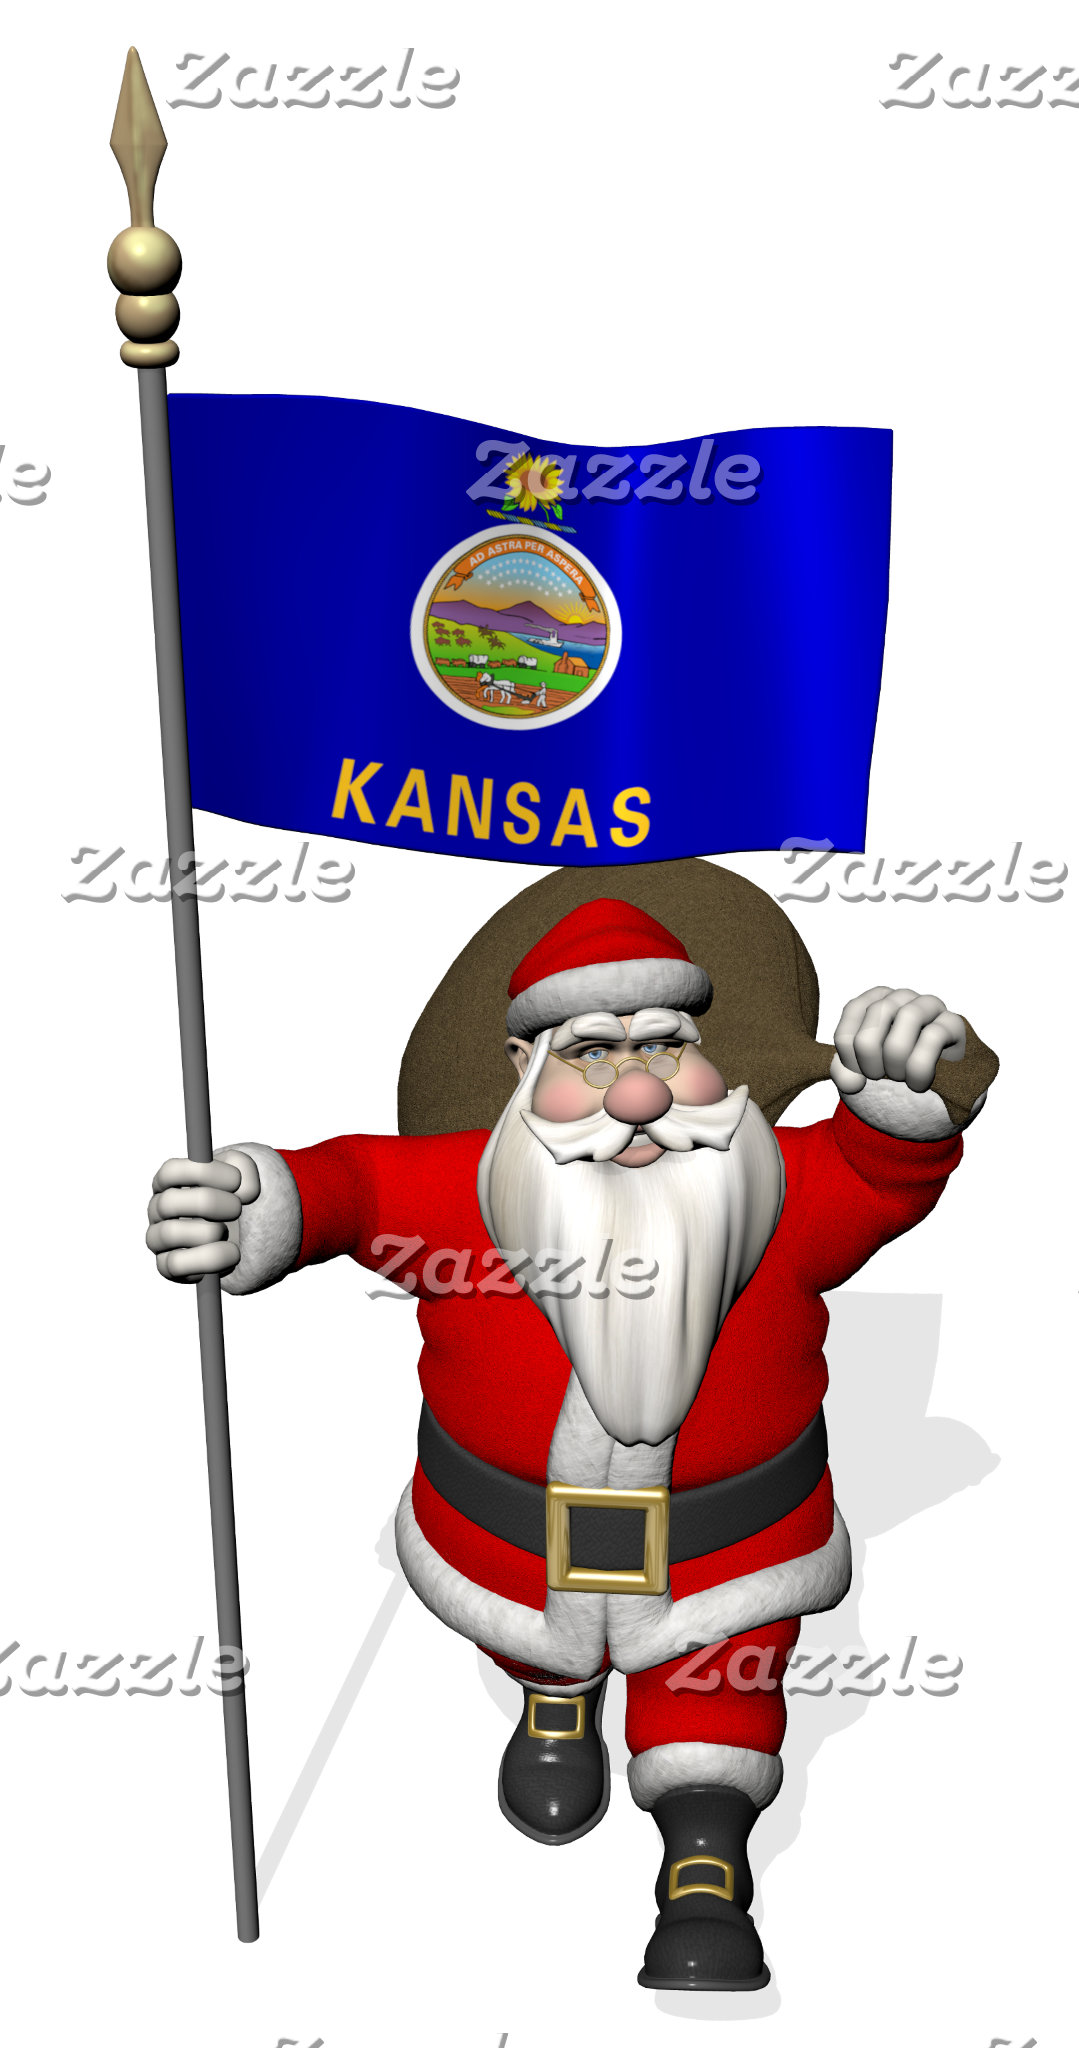 Kansas - The Sunflower State